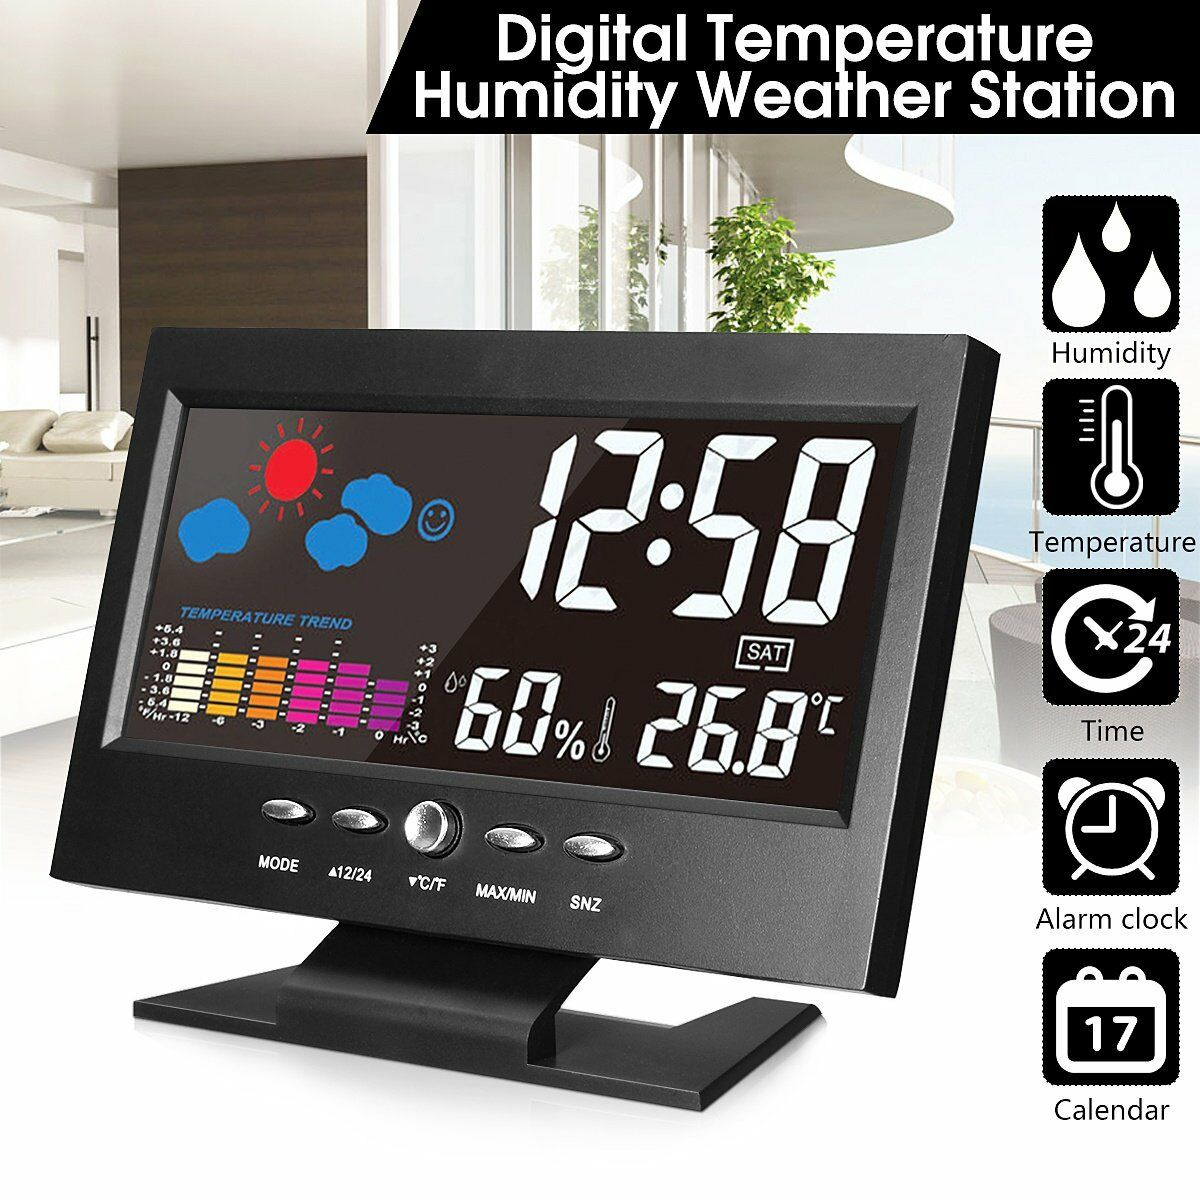 110 Degrees Celsius Temperatur SGH 40 Degrees Celsius Thermometer digital LCD